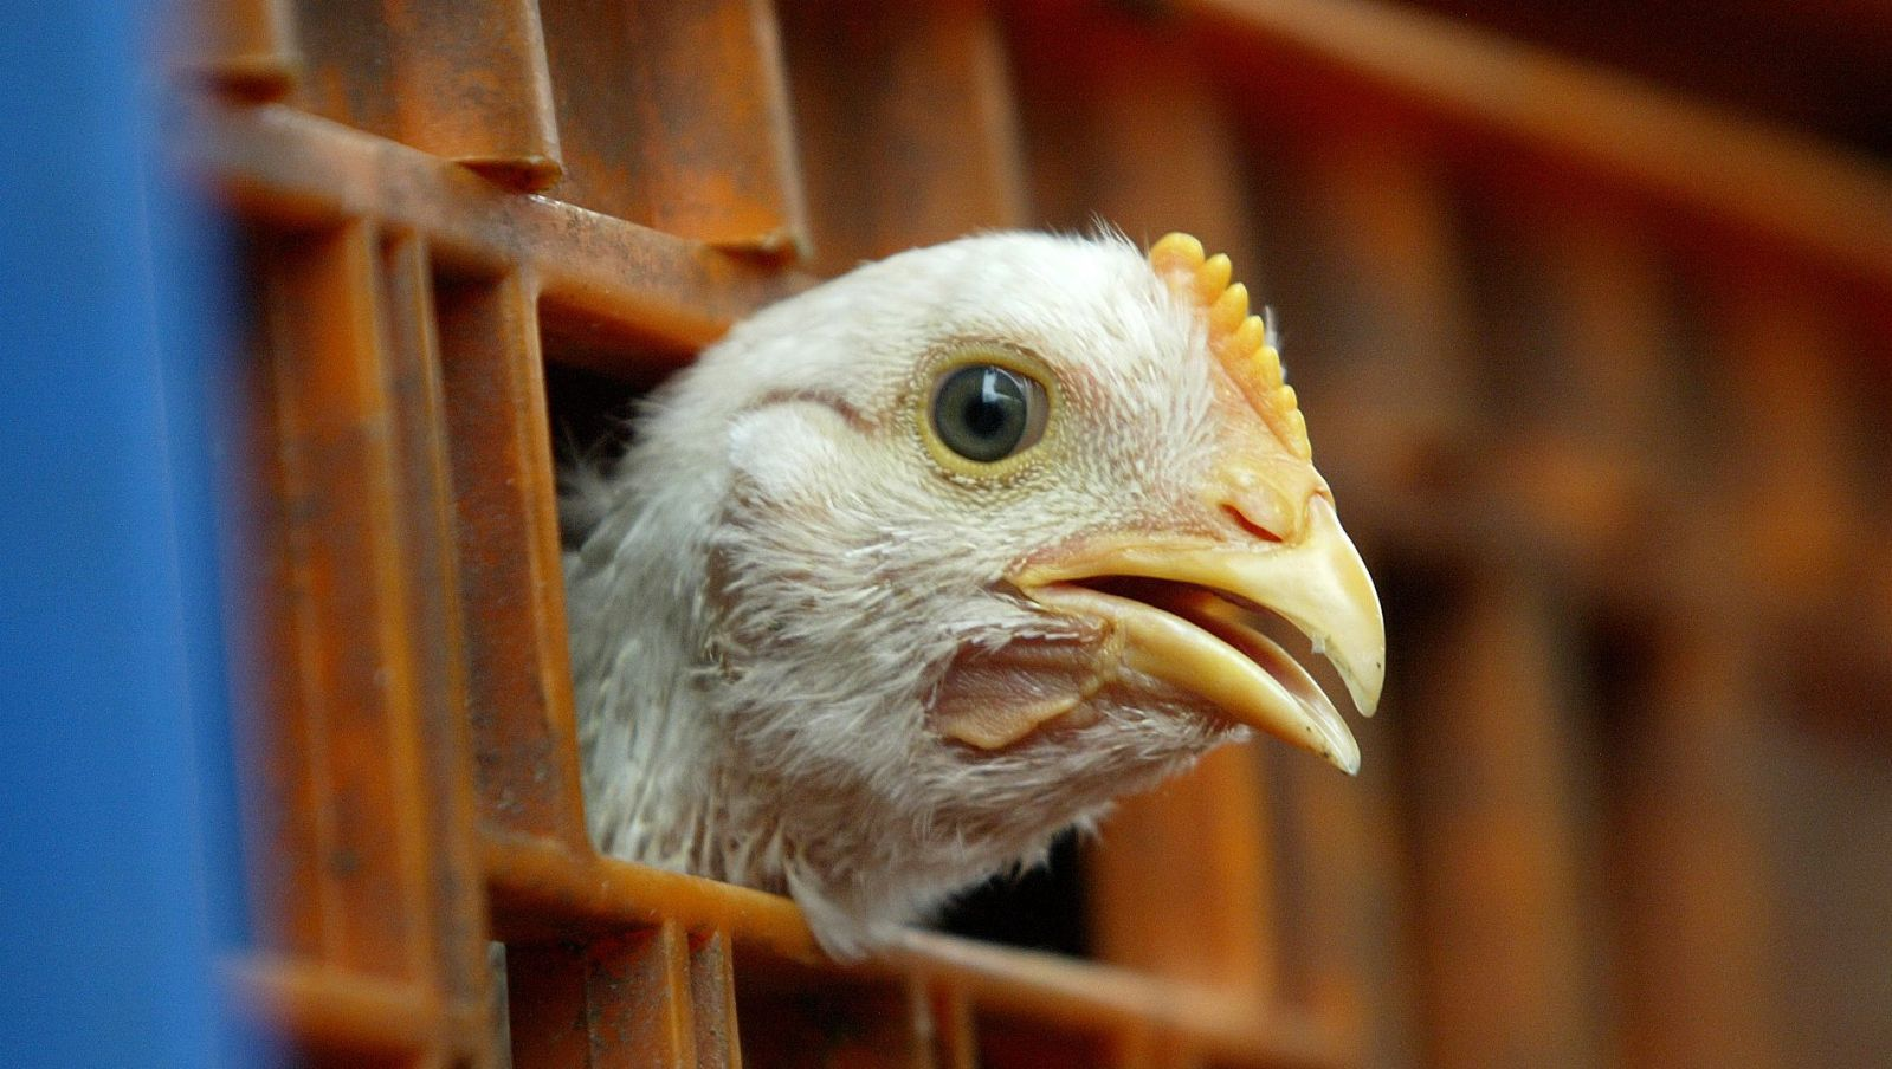 chlorinated chicken - photo #14